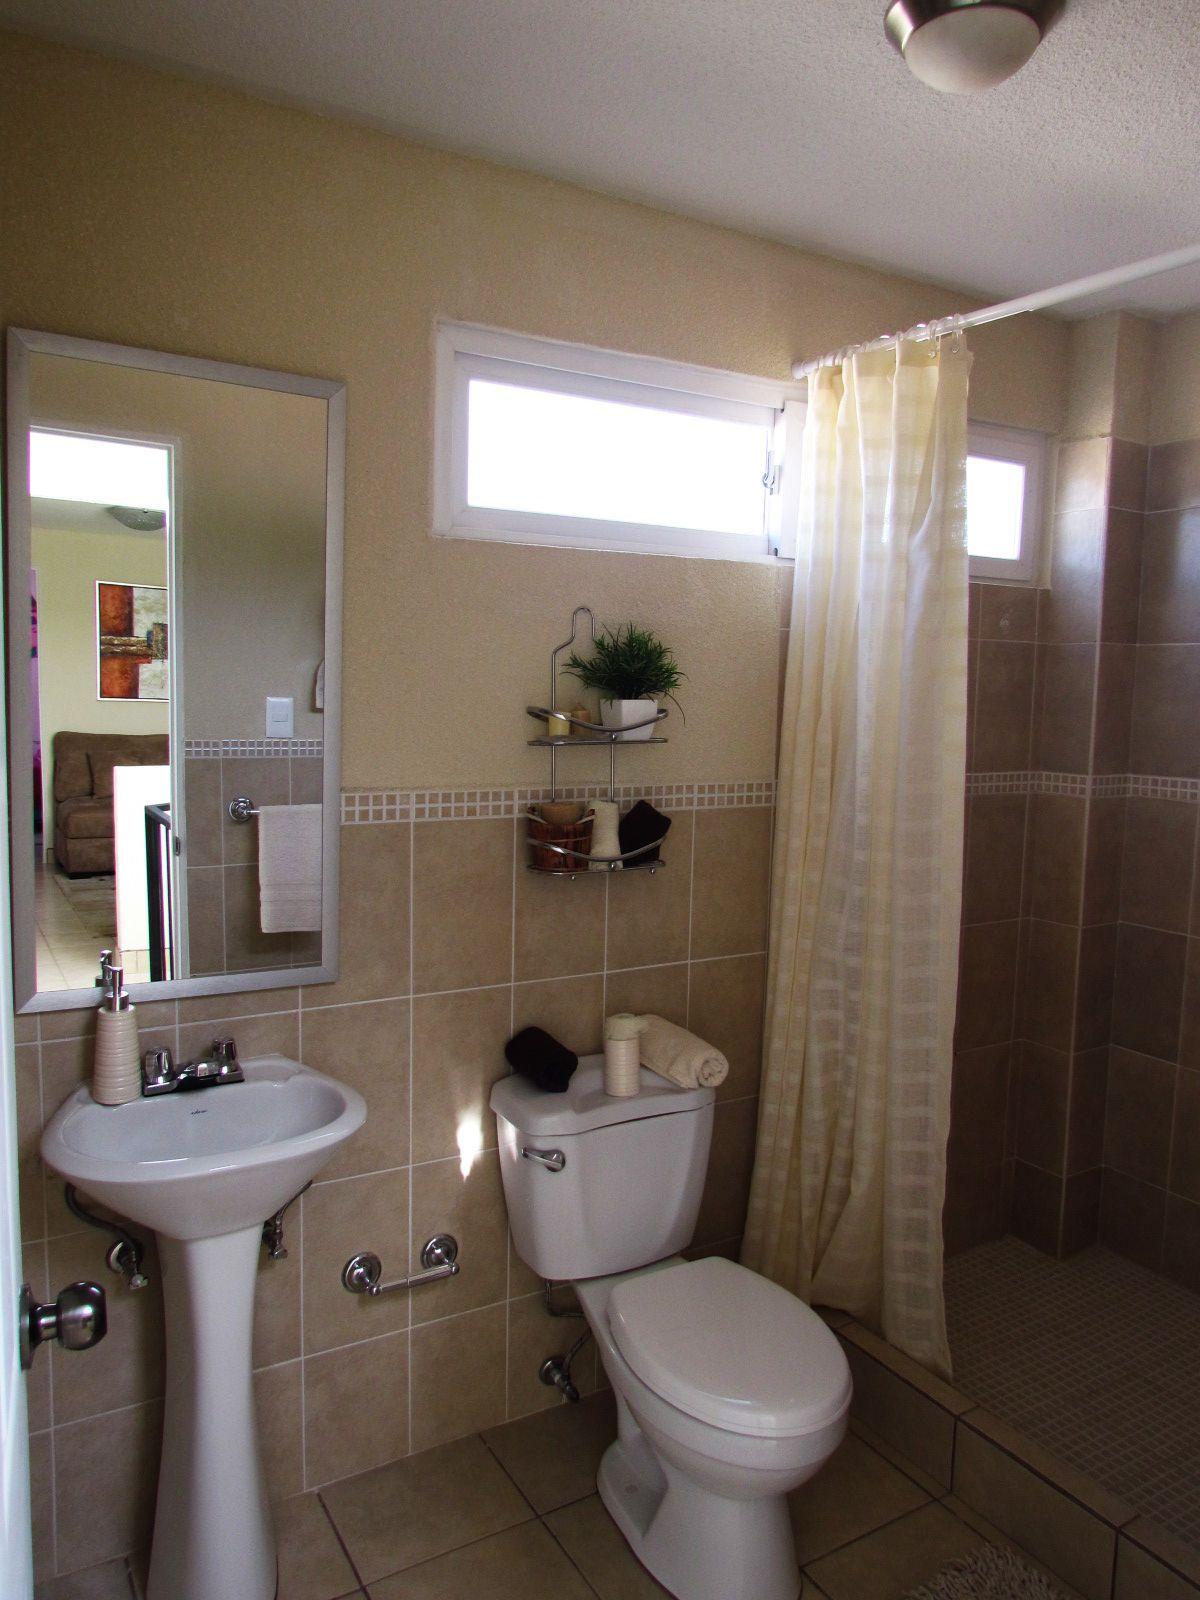 Ba o principal casa modelo ca adas del carmen ba os for Decoraciones de banos modernos sencillos